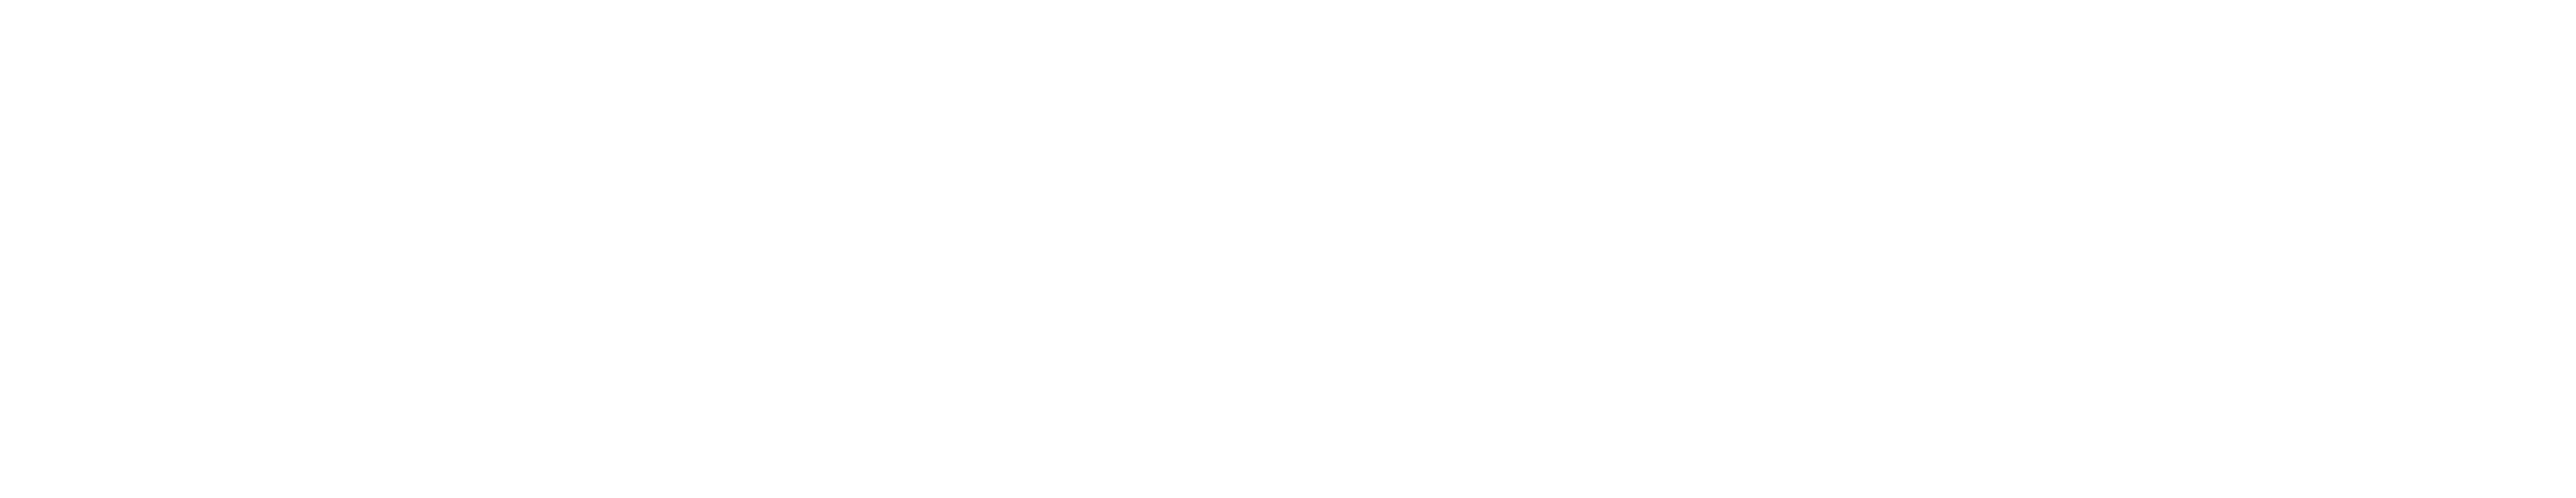 DataPaulette